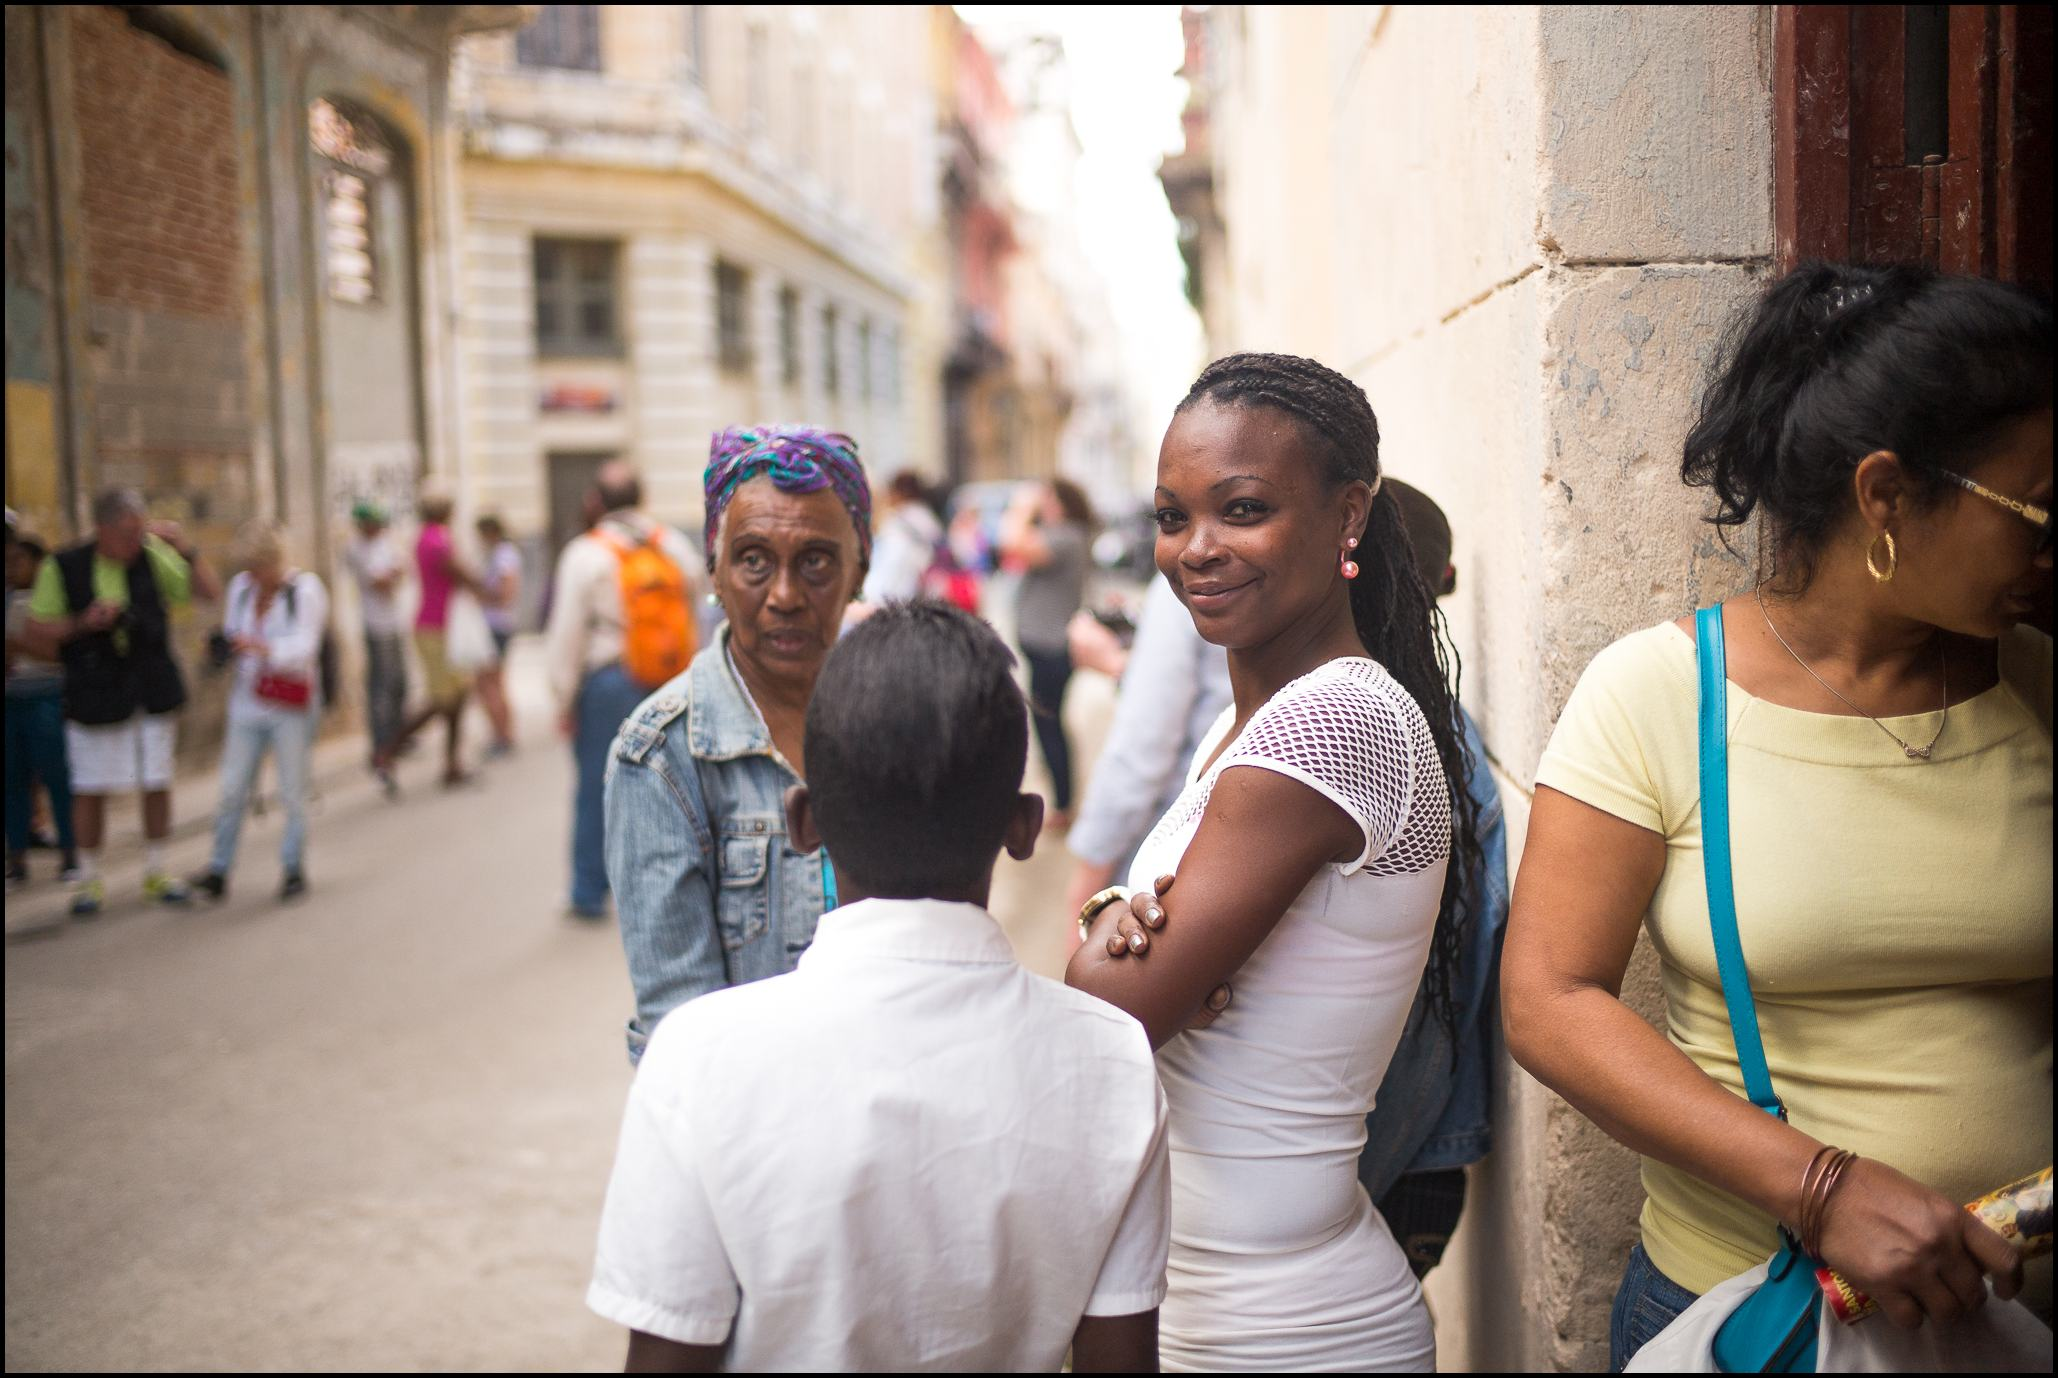 20160215 Cuba-Day 3-1006336.jpg